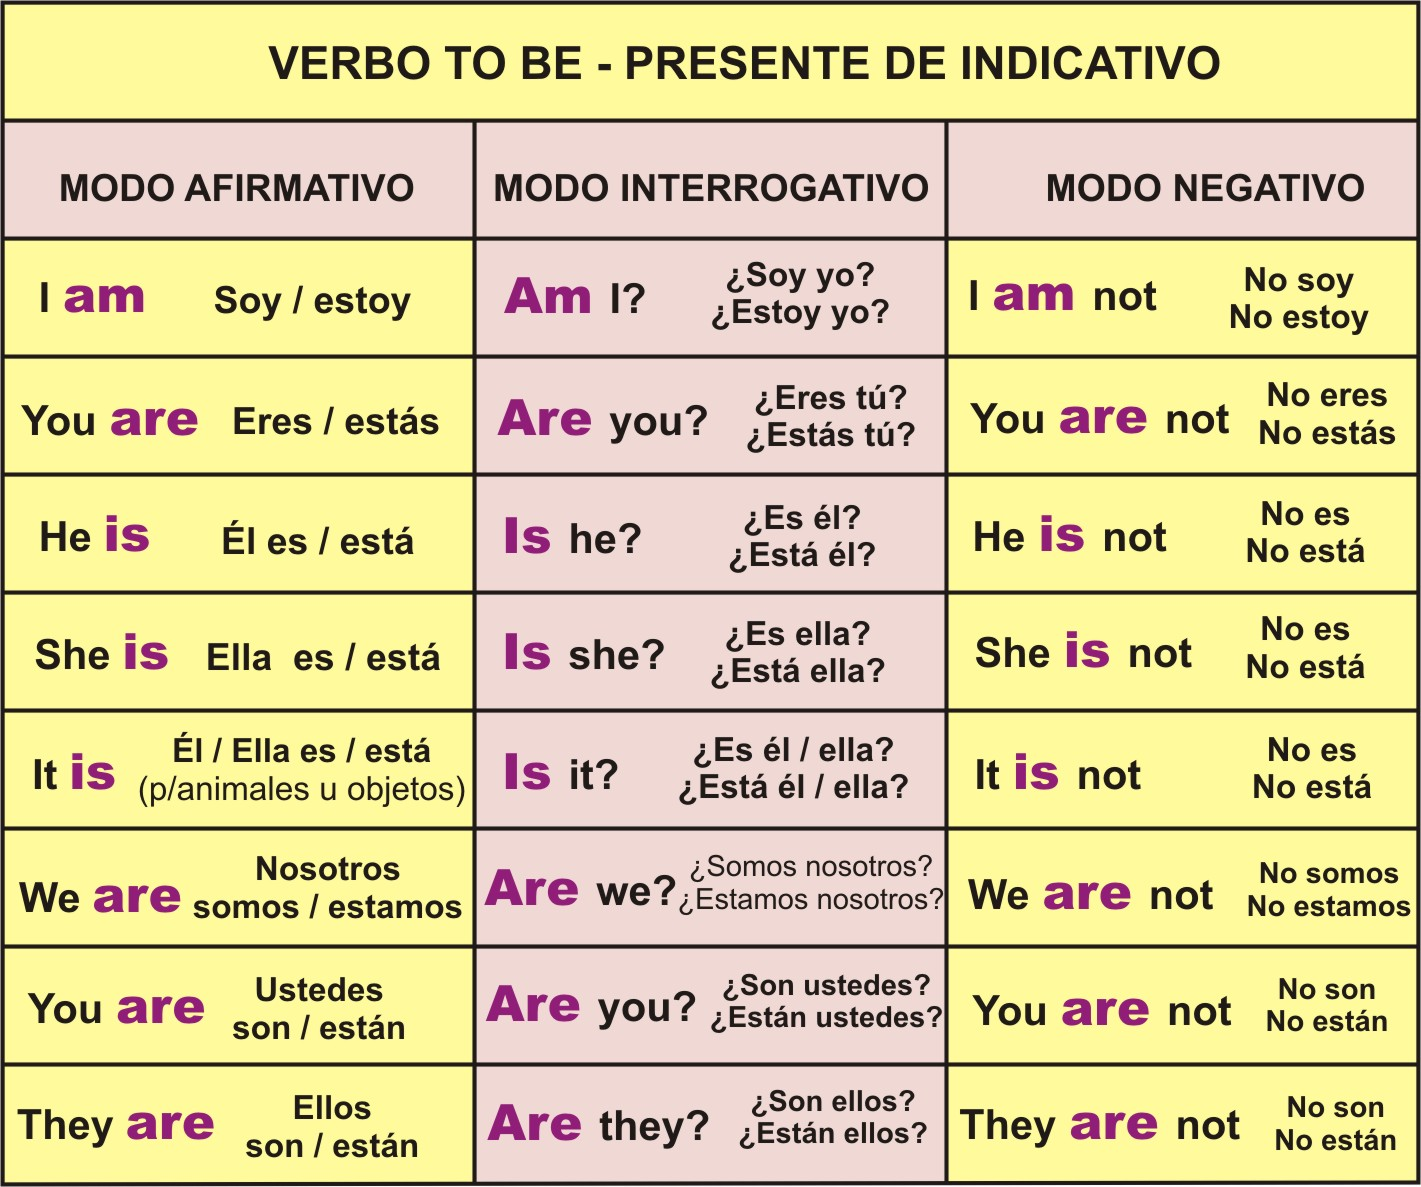 Bilingual al yussana enero 2013 for Tiempo aprender ingles